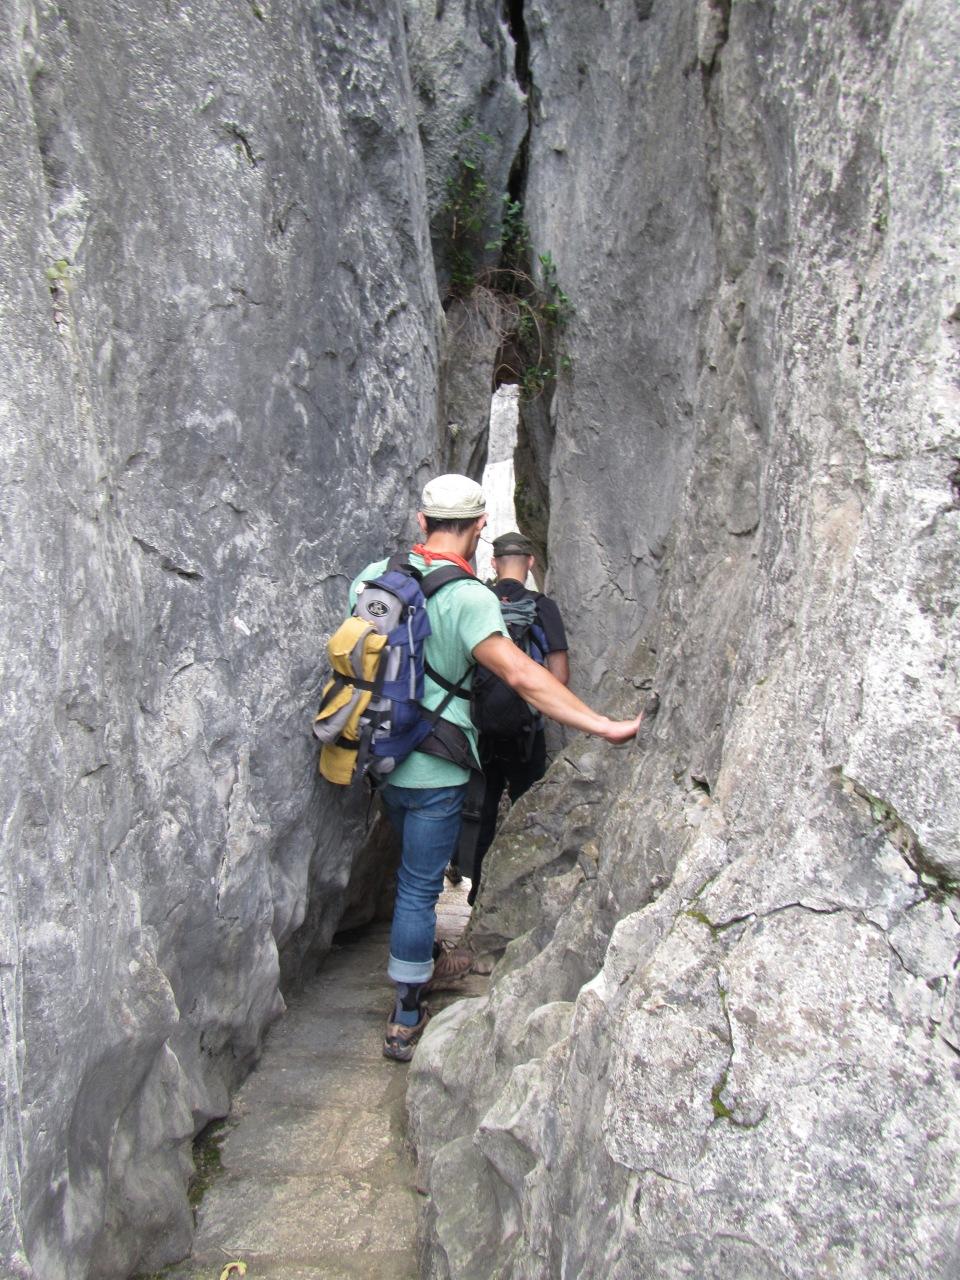 6445 - waking around the stone forest near Kunming